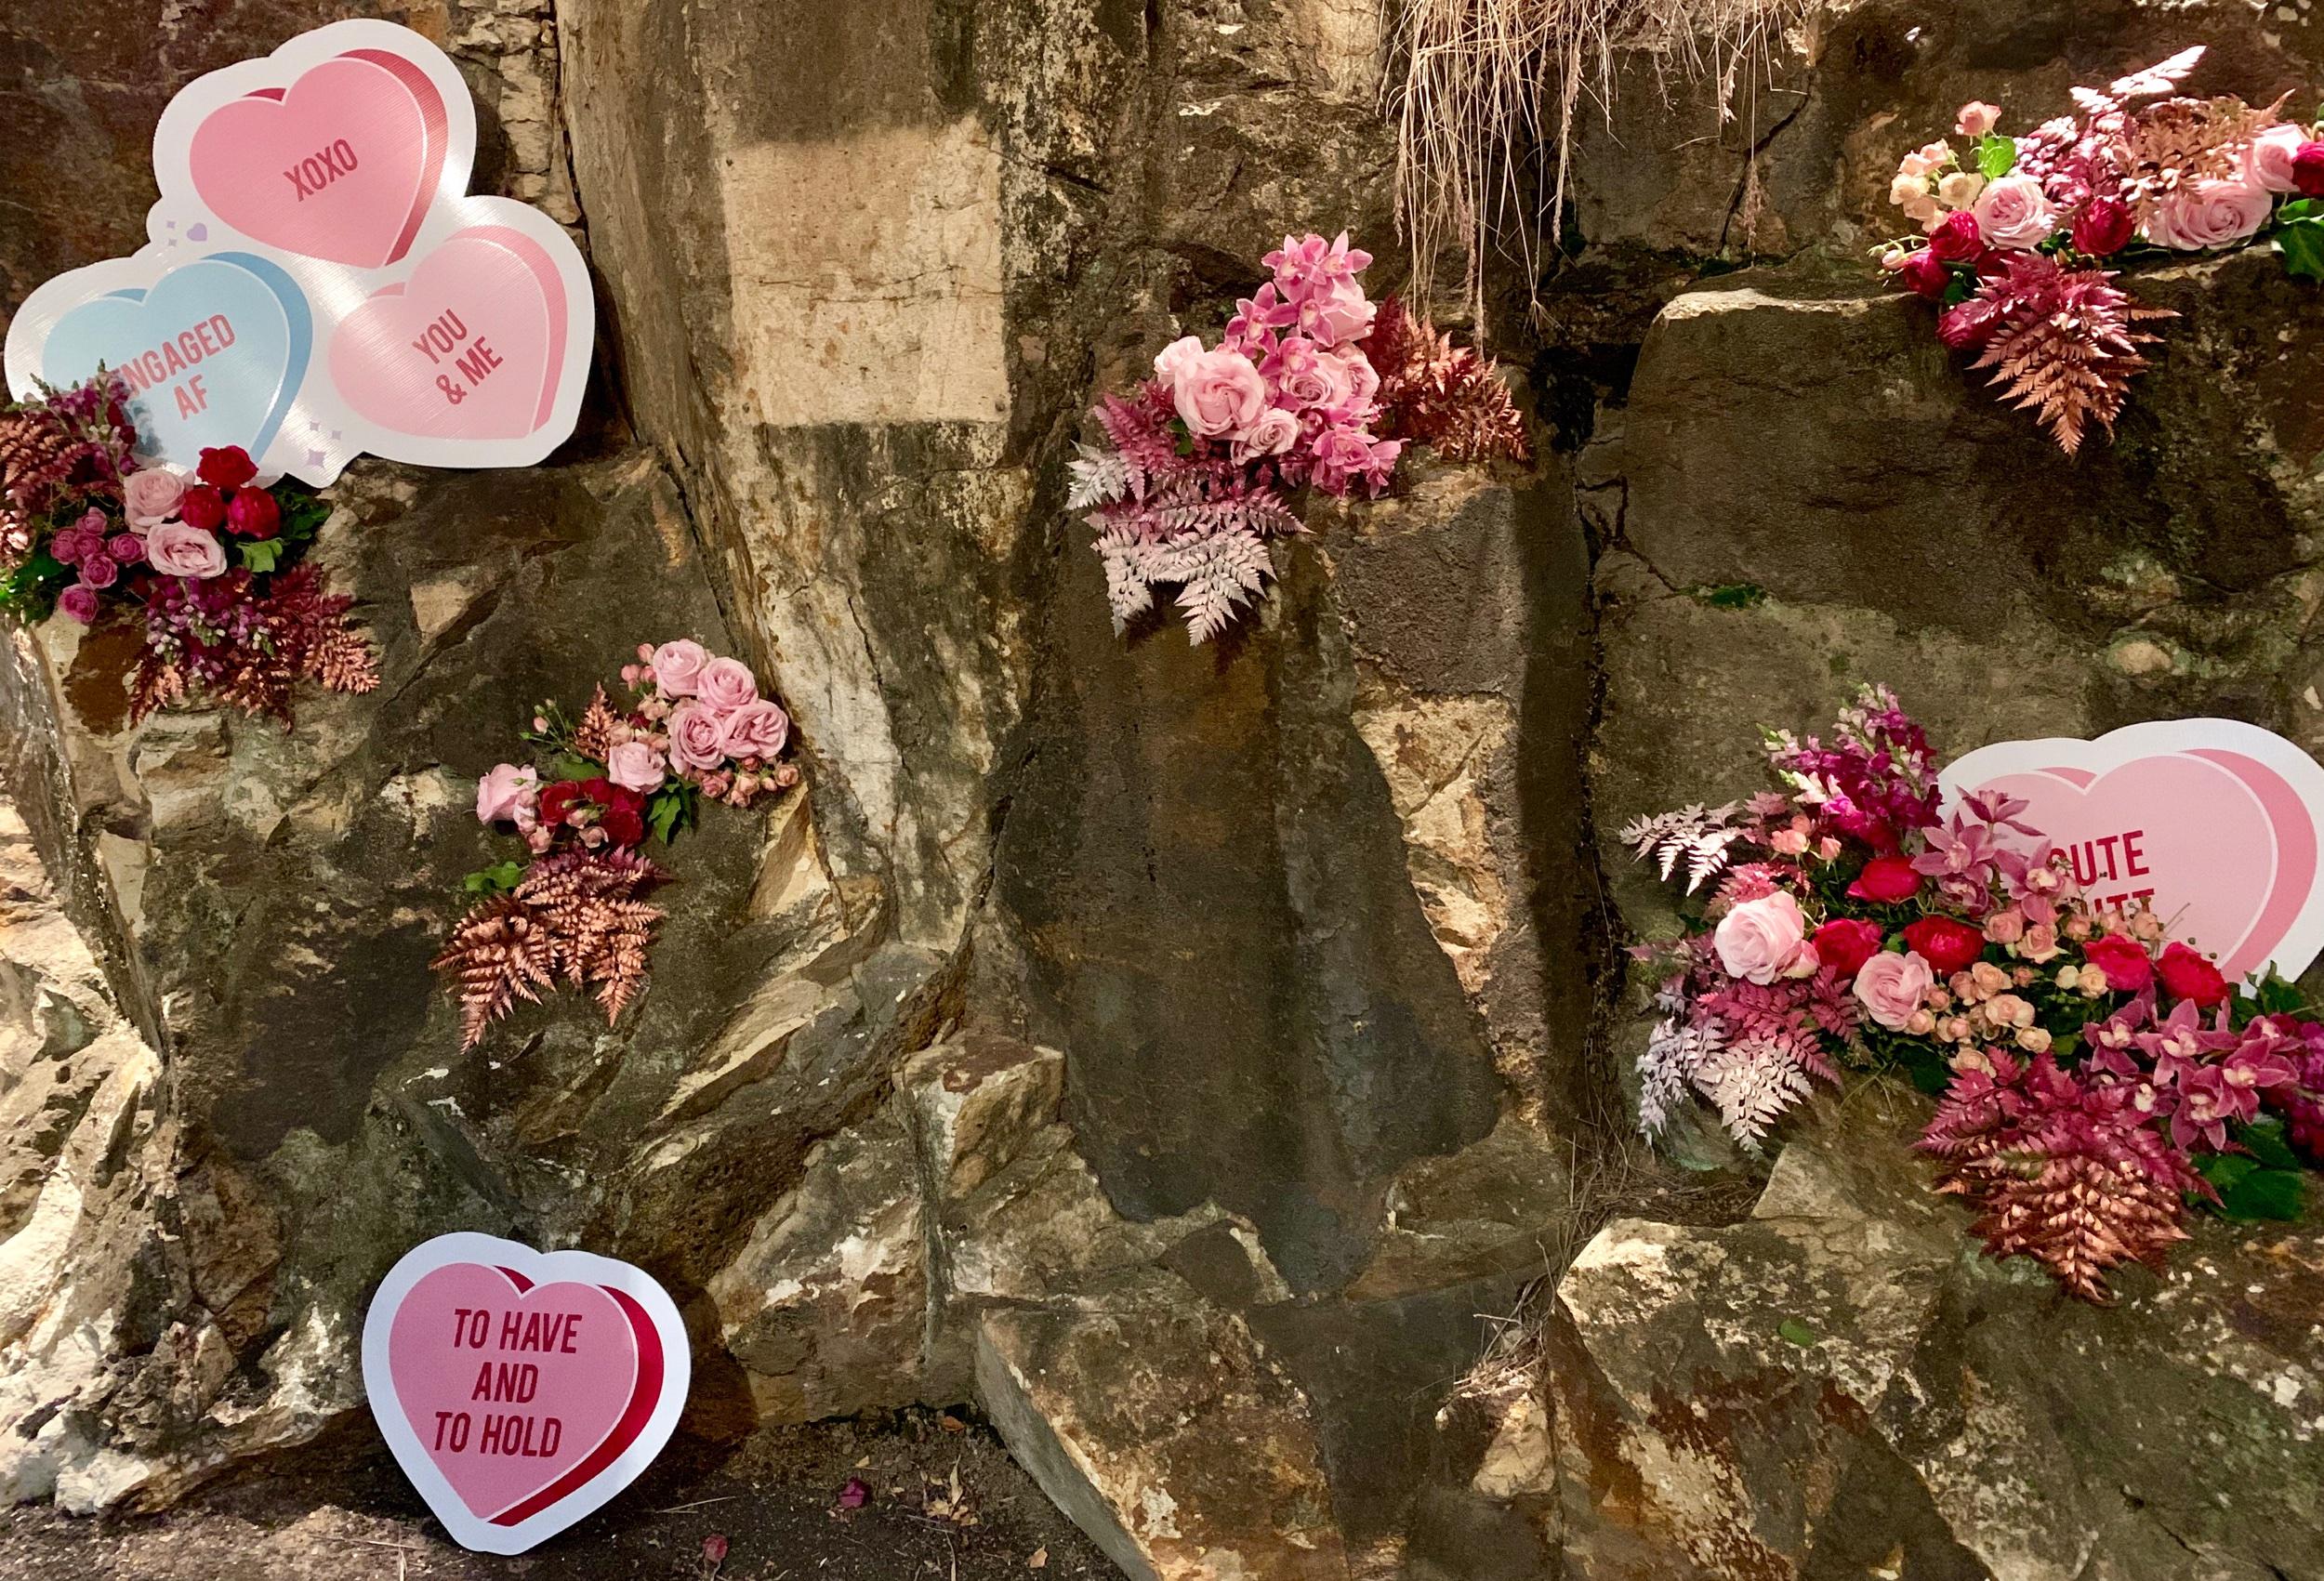 Wedding Harvest Courtyard Decor Pink Florals Cute Signage